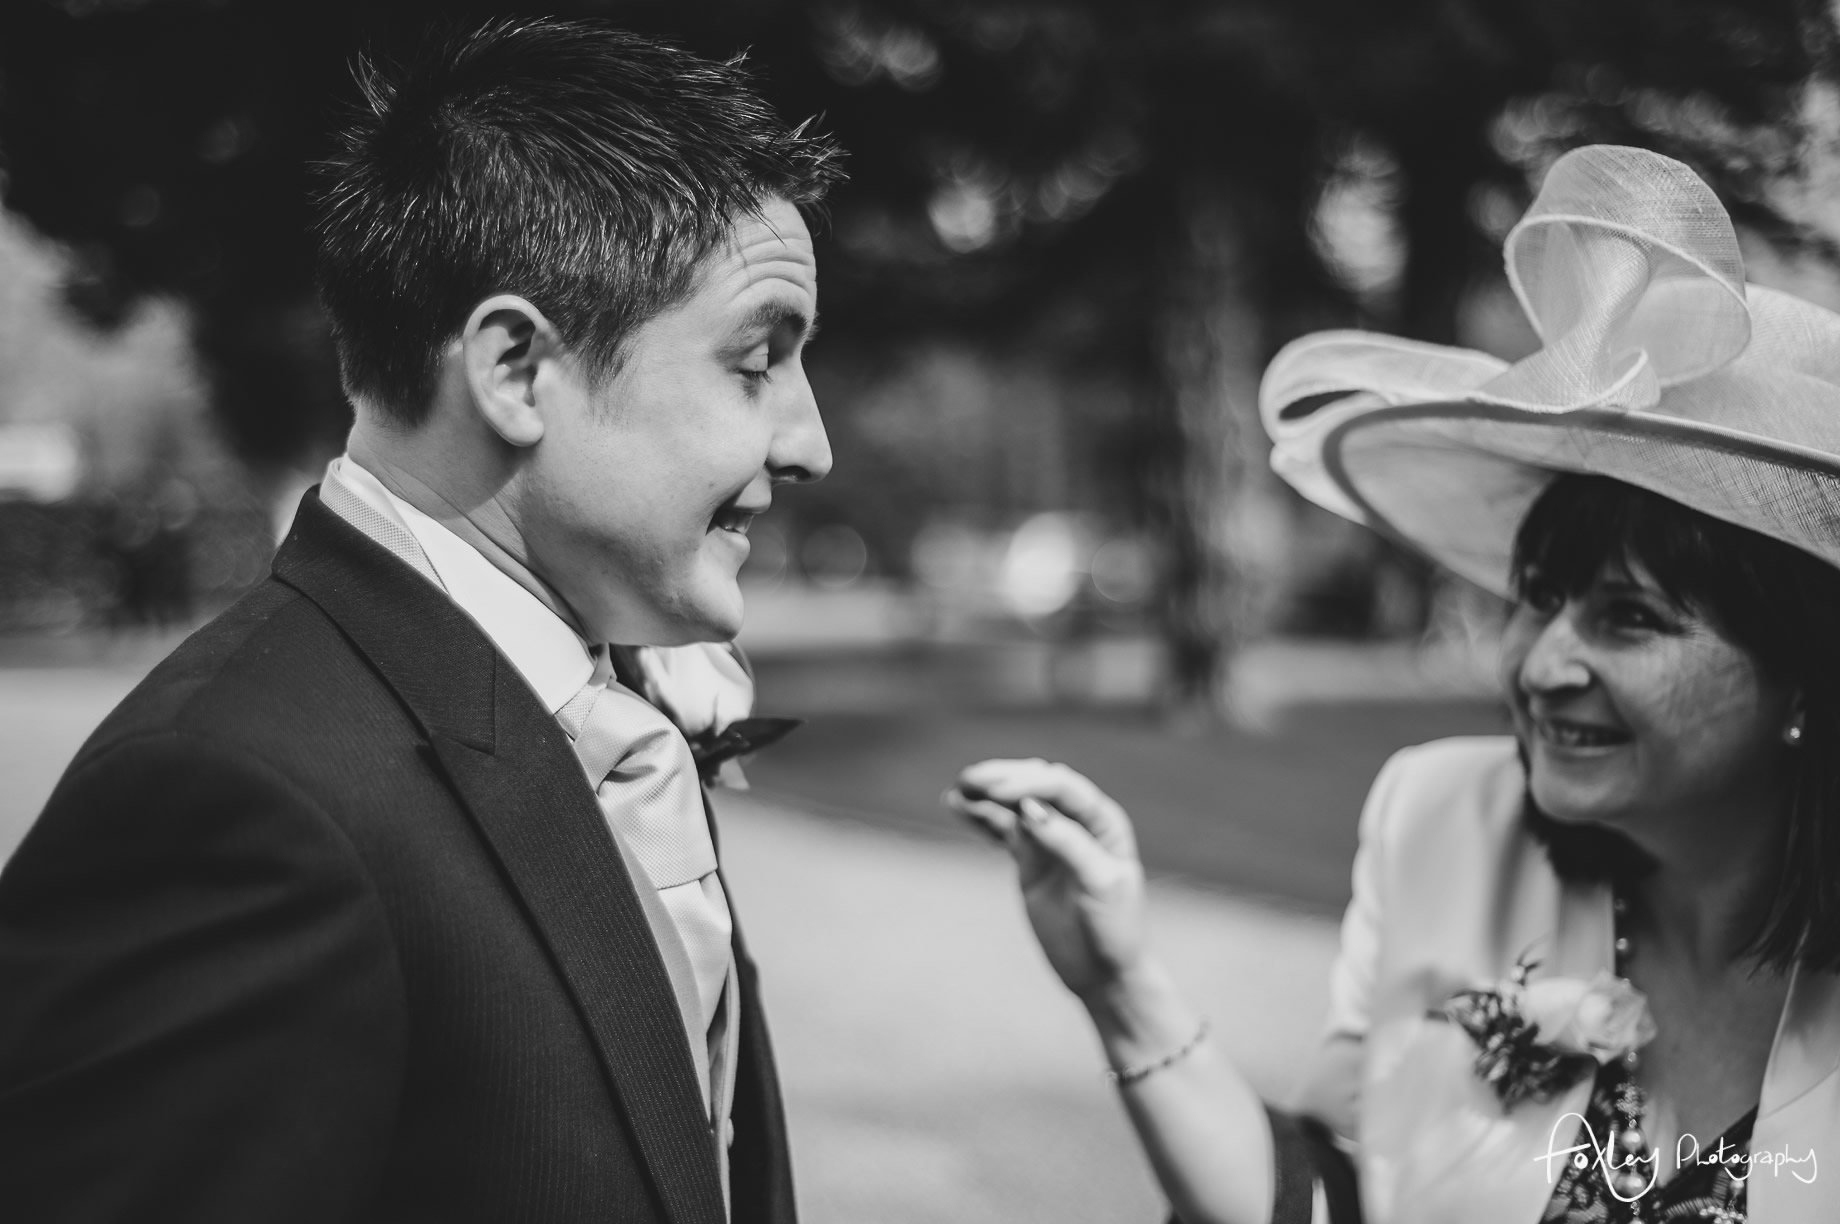 Gemma and Lewis' Wedding at Mitton Hall 057